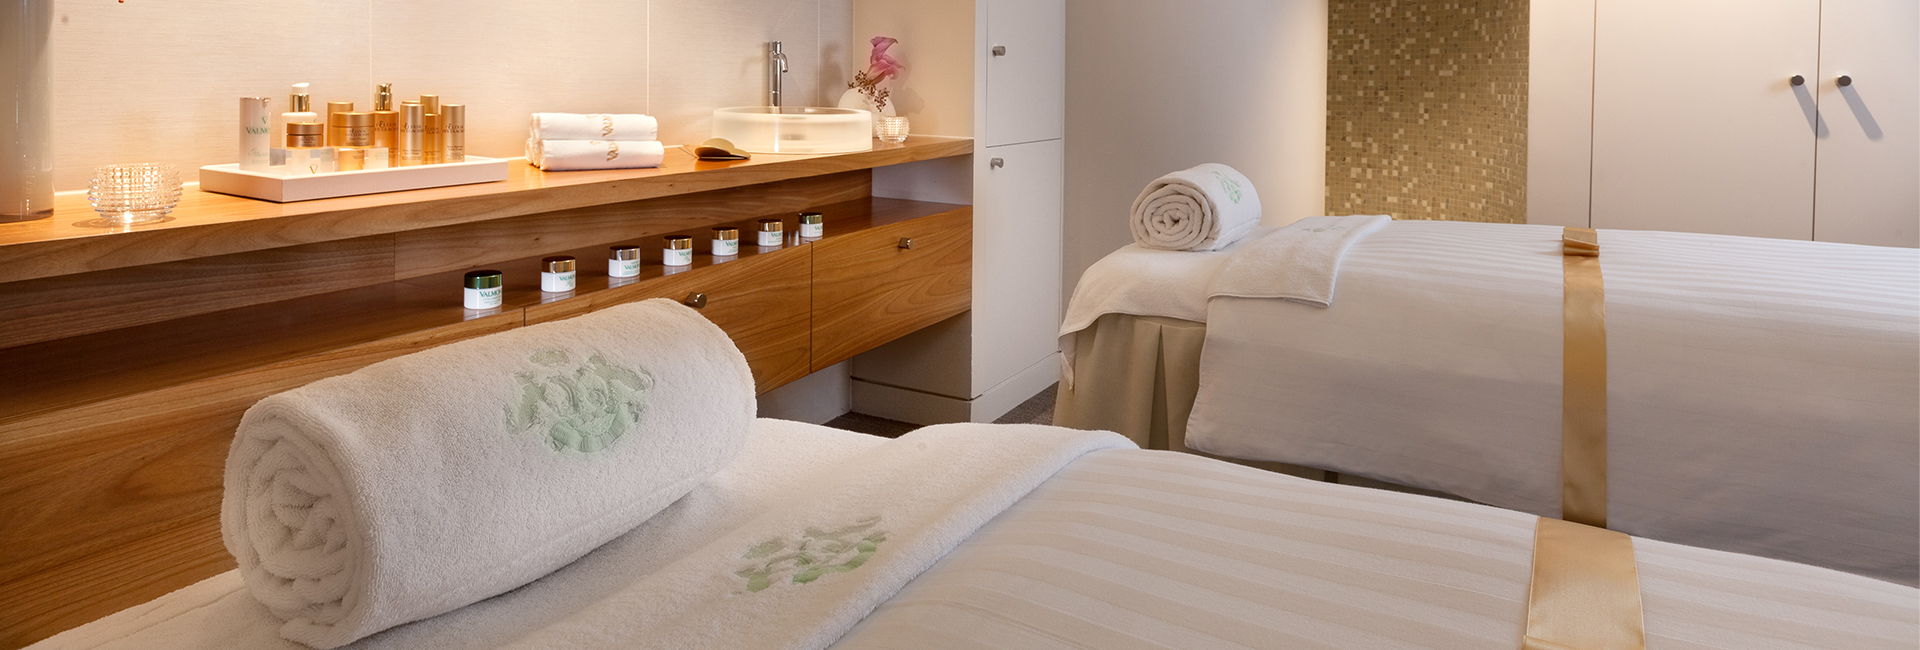 monsieur-m-soin-valmont-hotel-meurice-blog-beaute-soin-parfum-homme